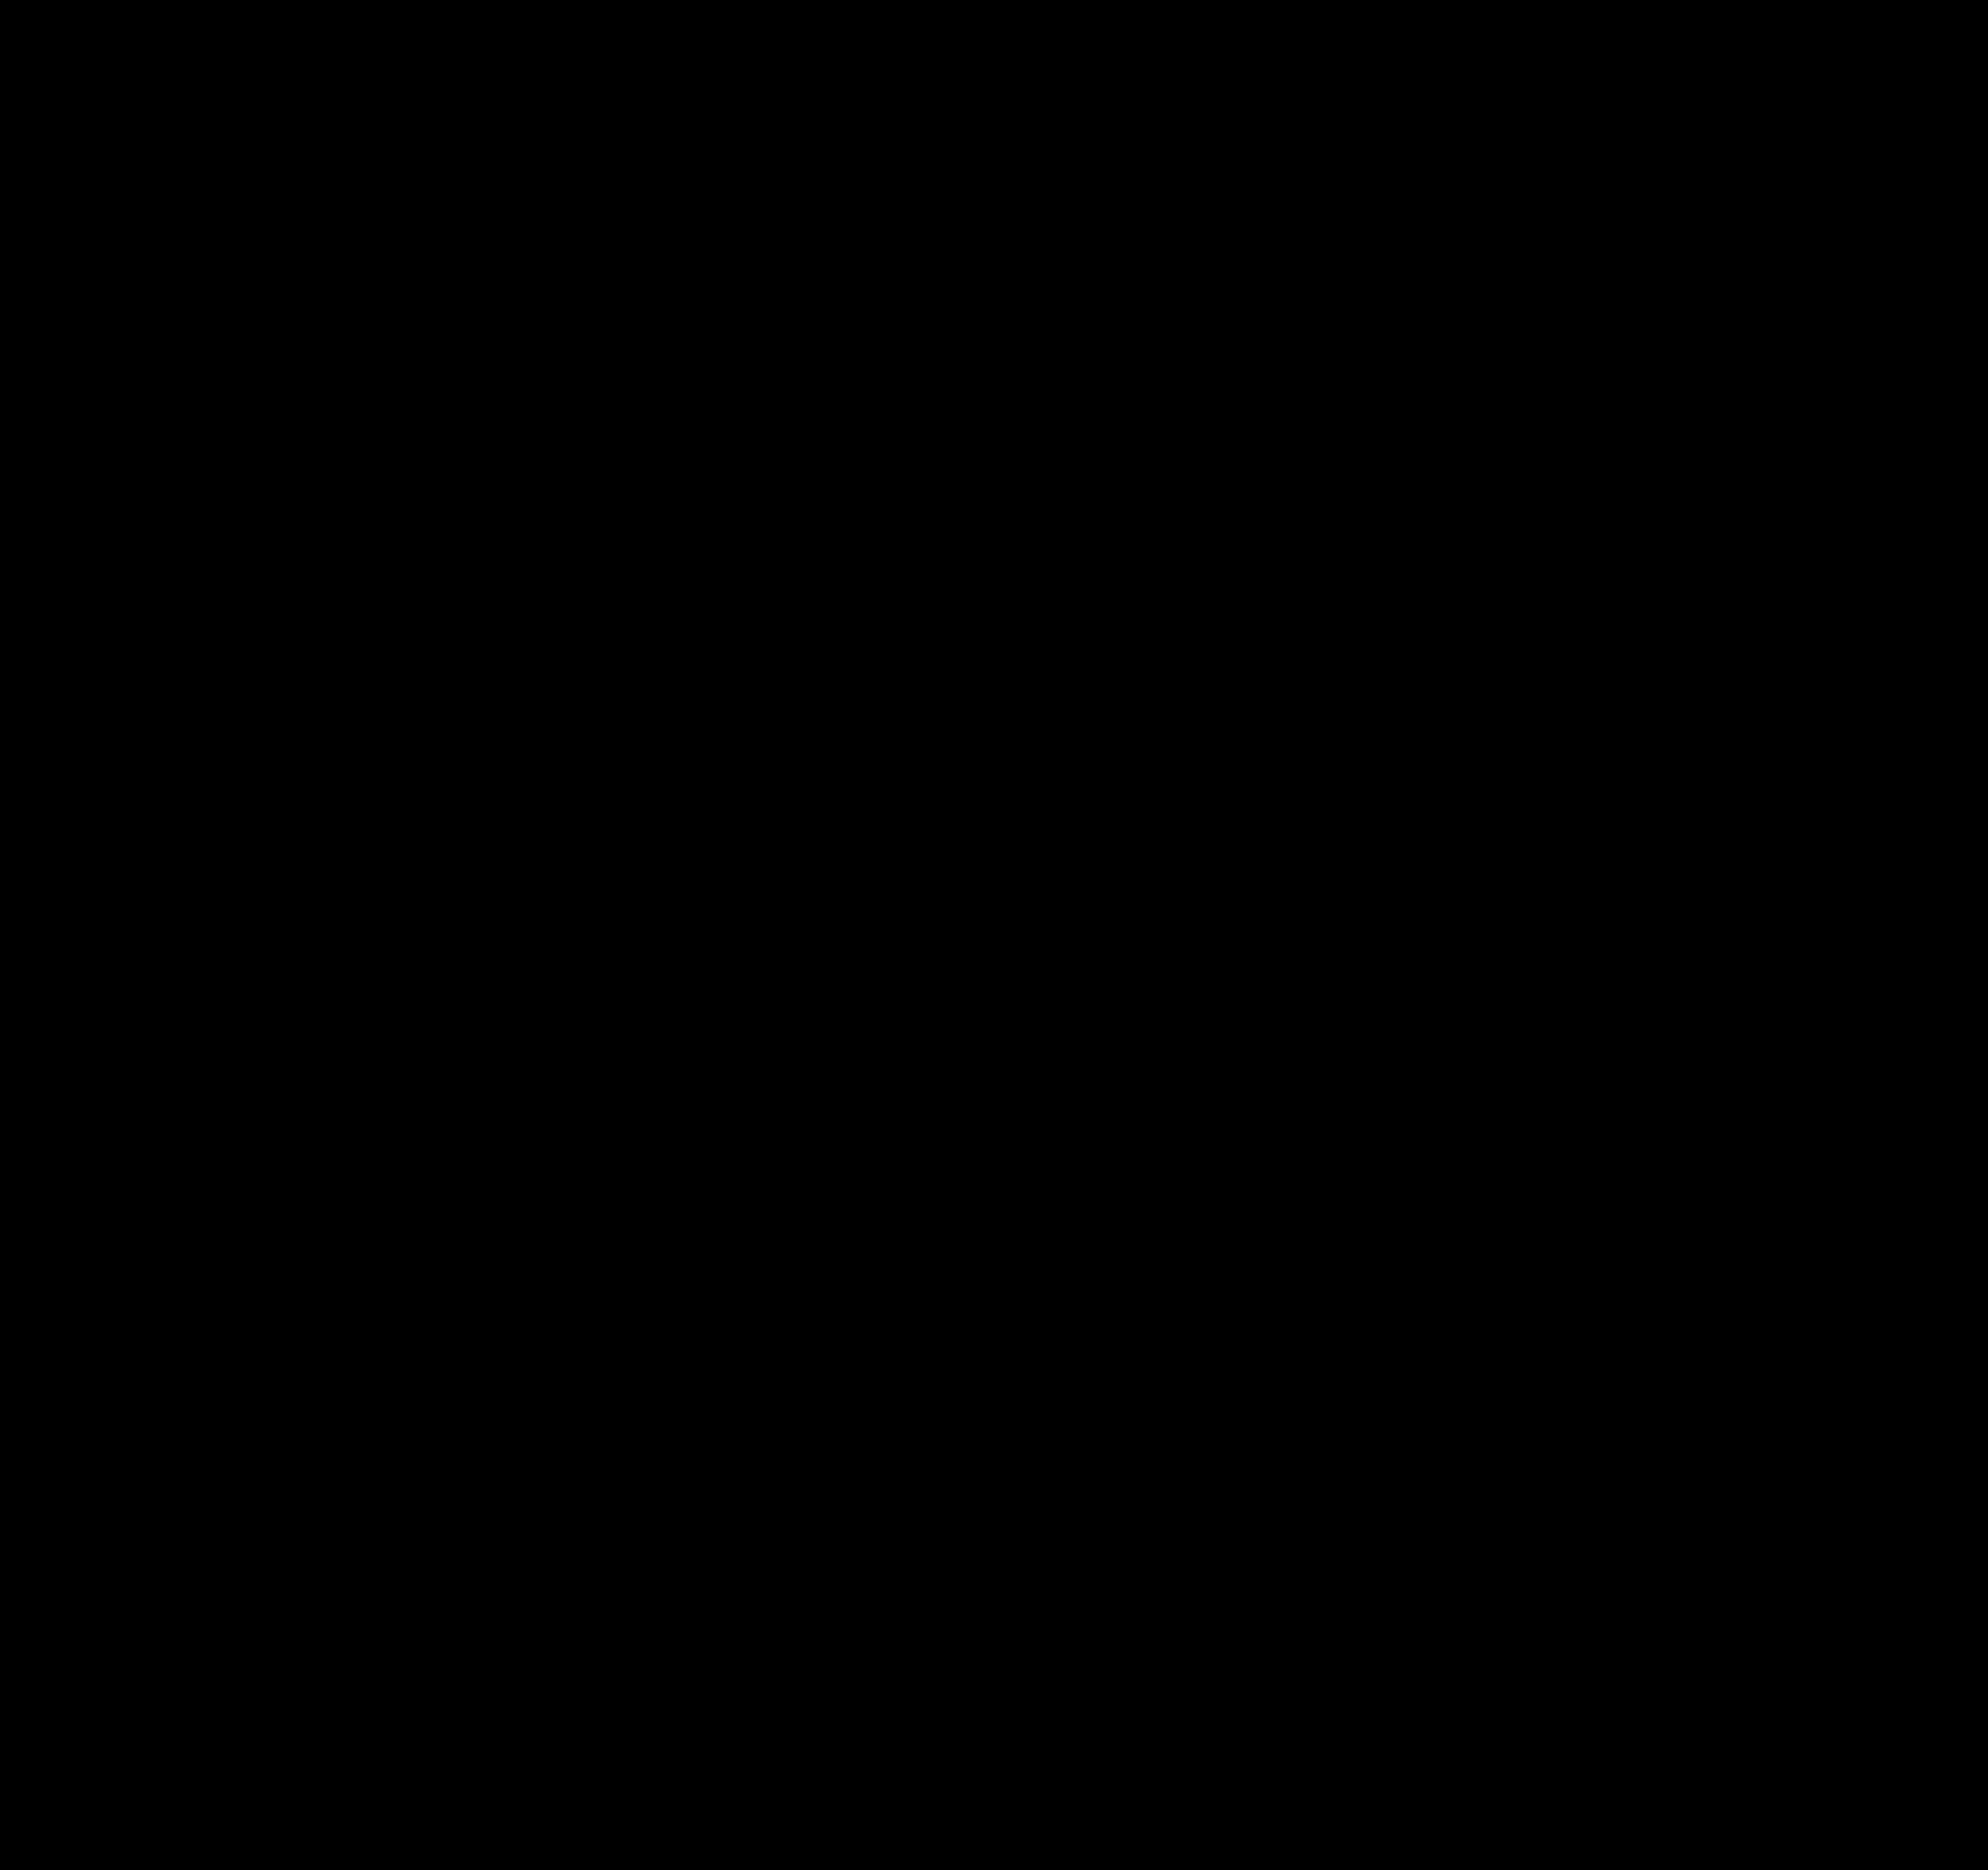 Biohazard symbol is used to promote placenta encapsulation safety